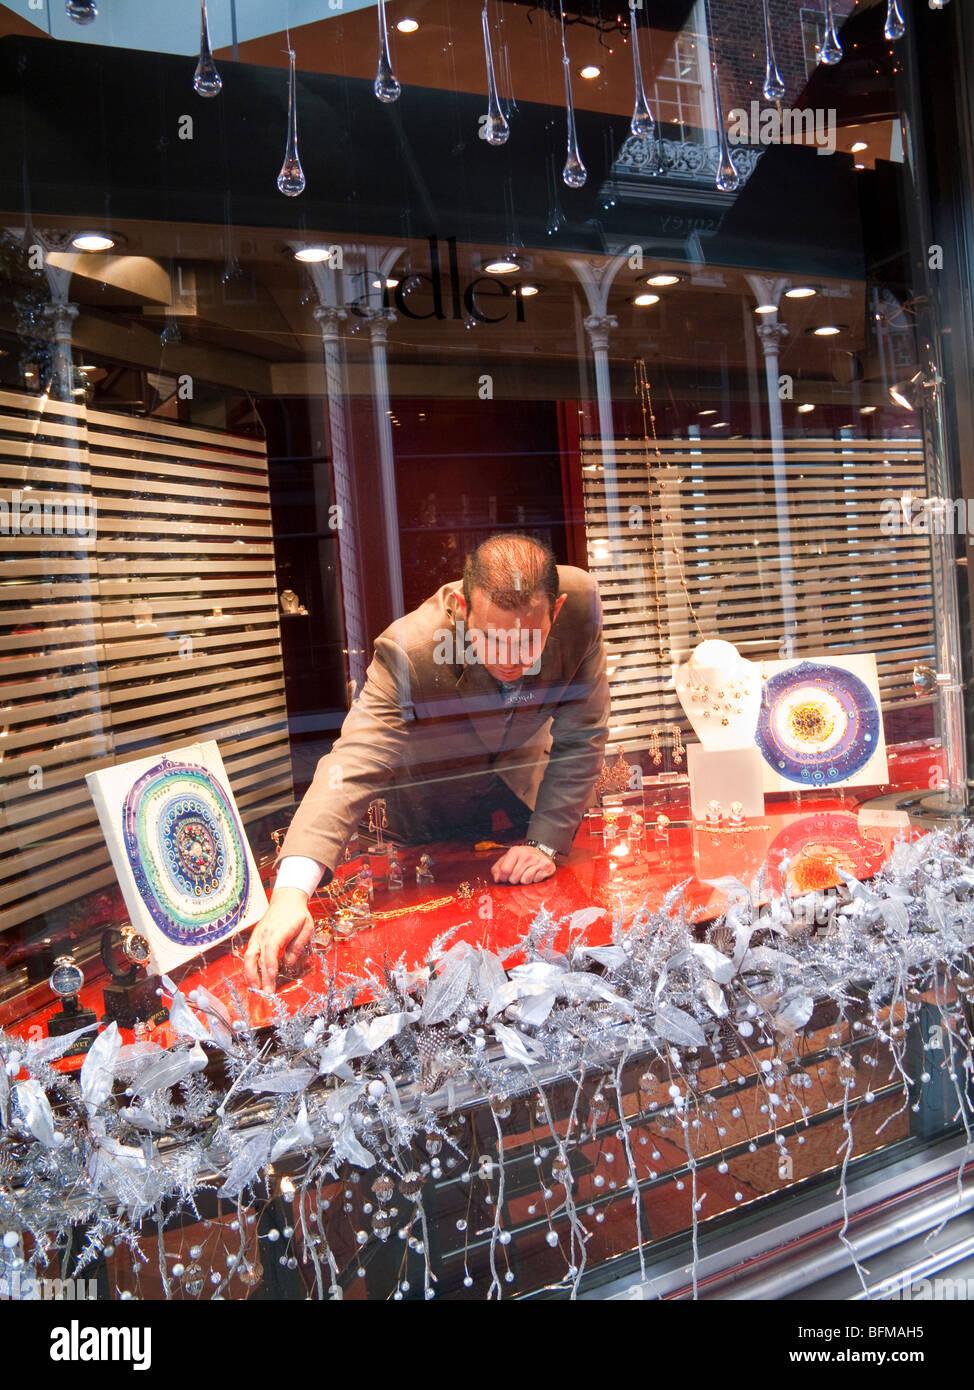 Christmas display in jeweller's shop, Old Bond Street, Mayfair, London, England, UK - Stock Image